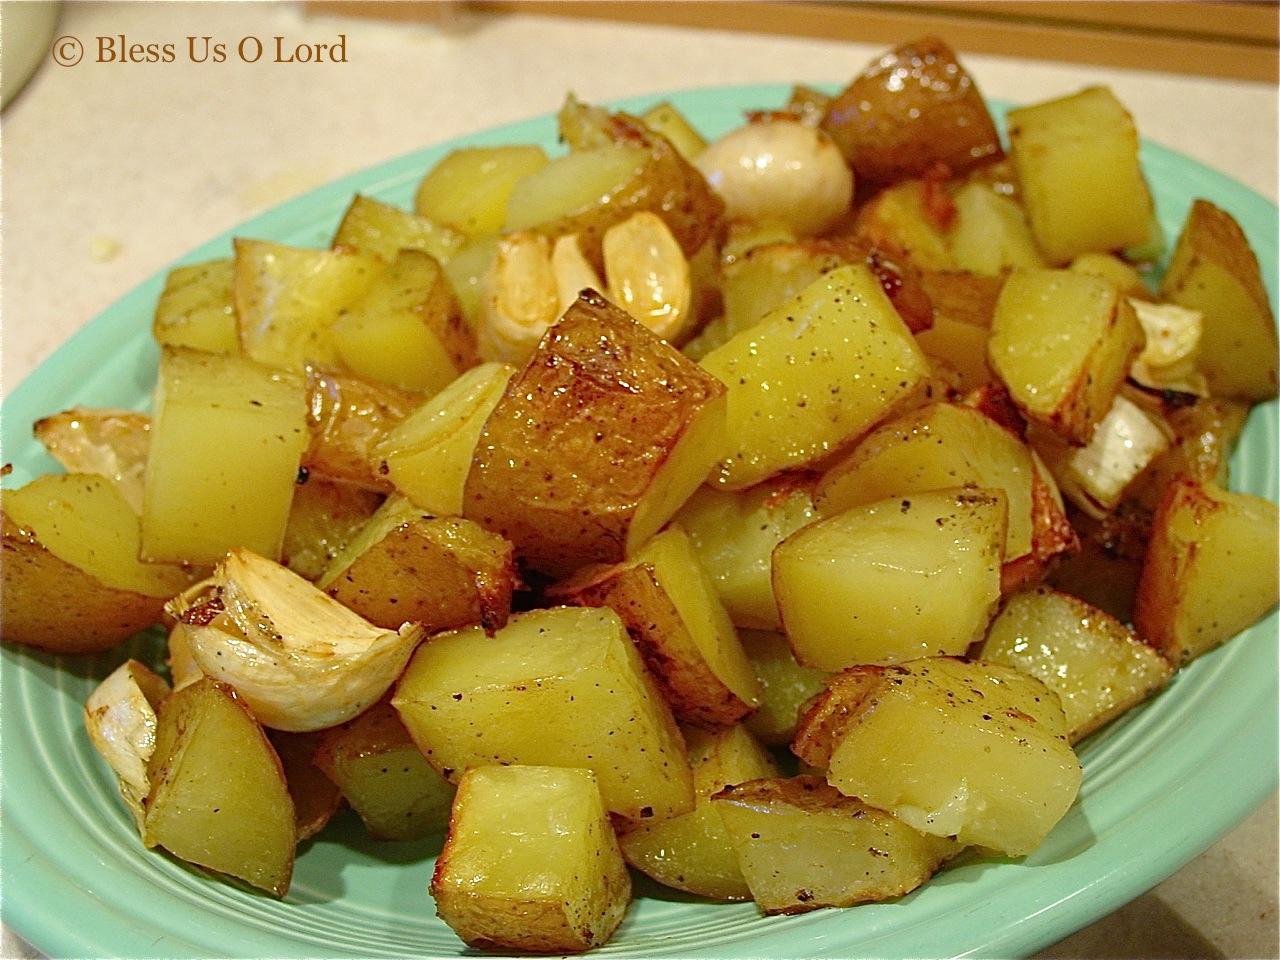 Bless Us O Lord...: Roasted Garlic Potatoes